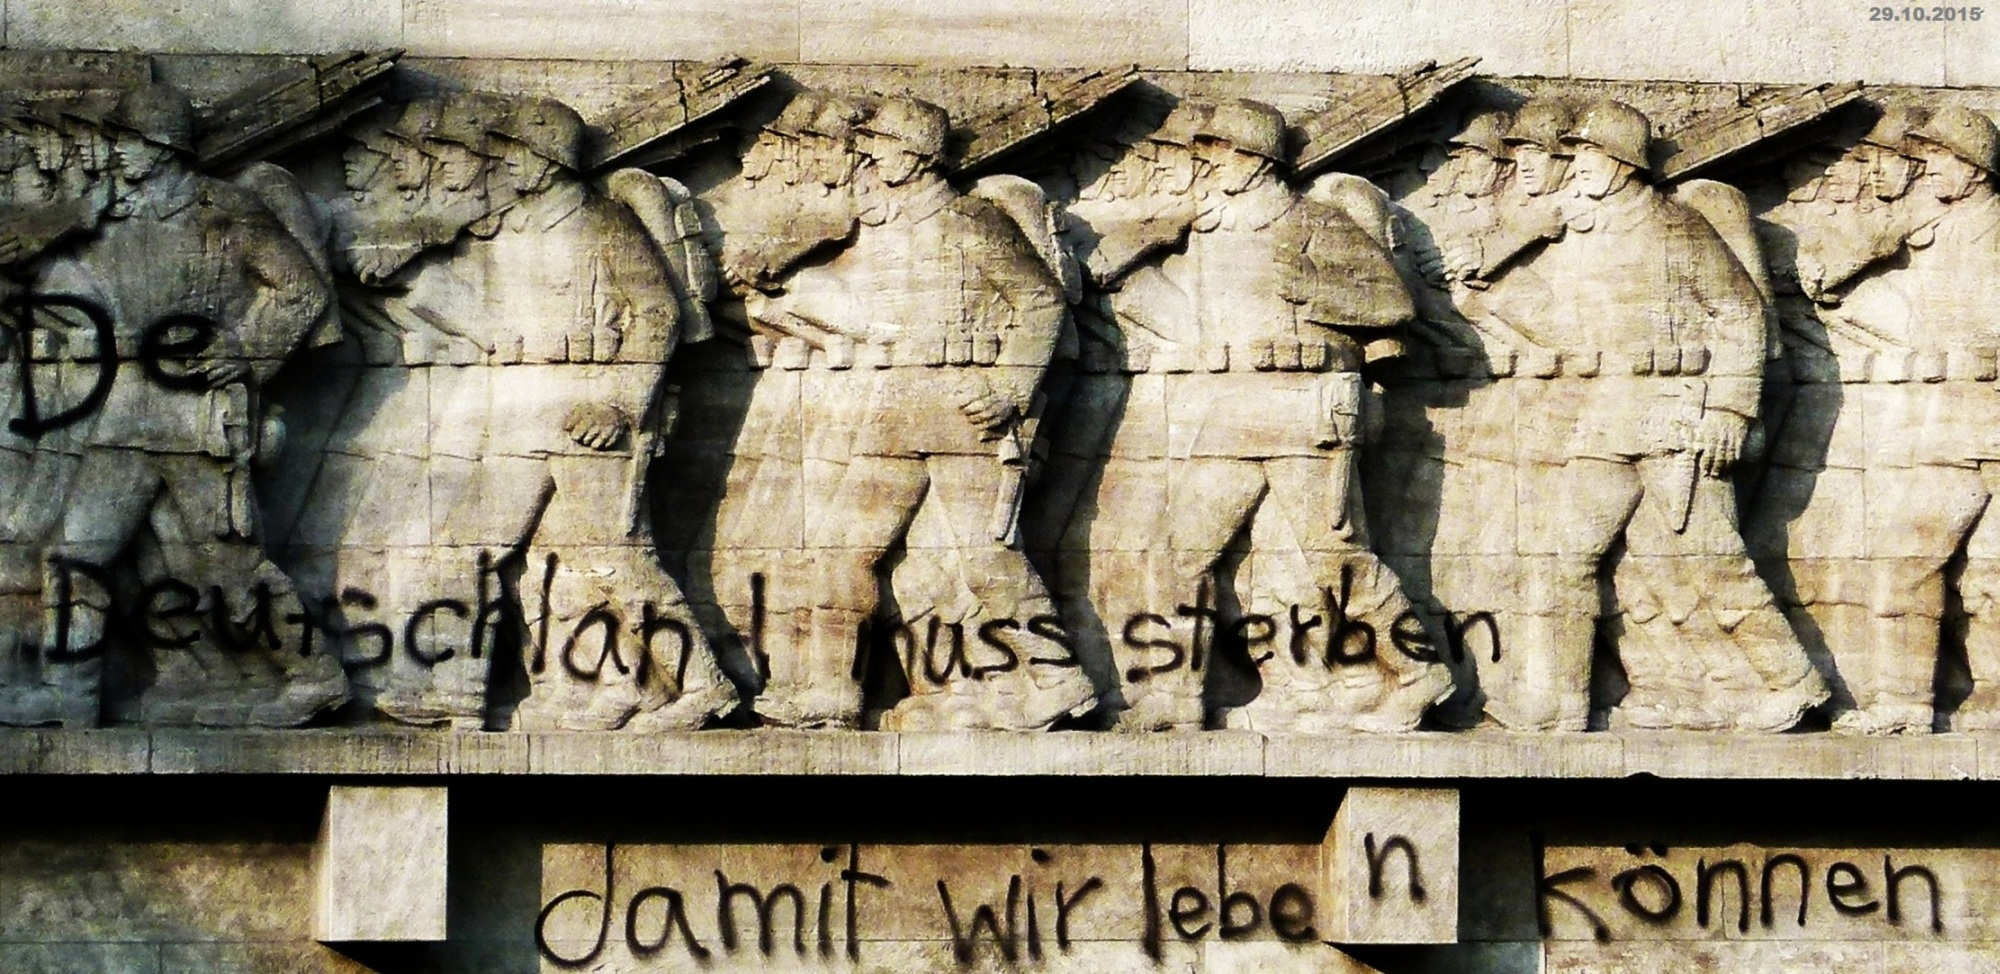 Kriegsklotz Hamburg